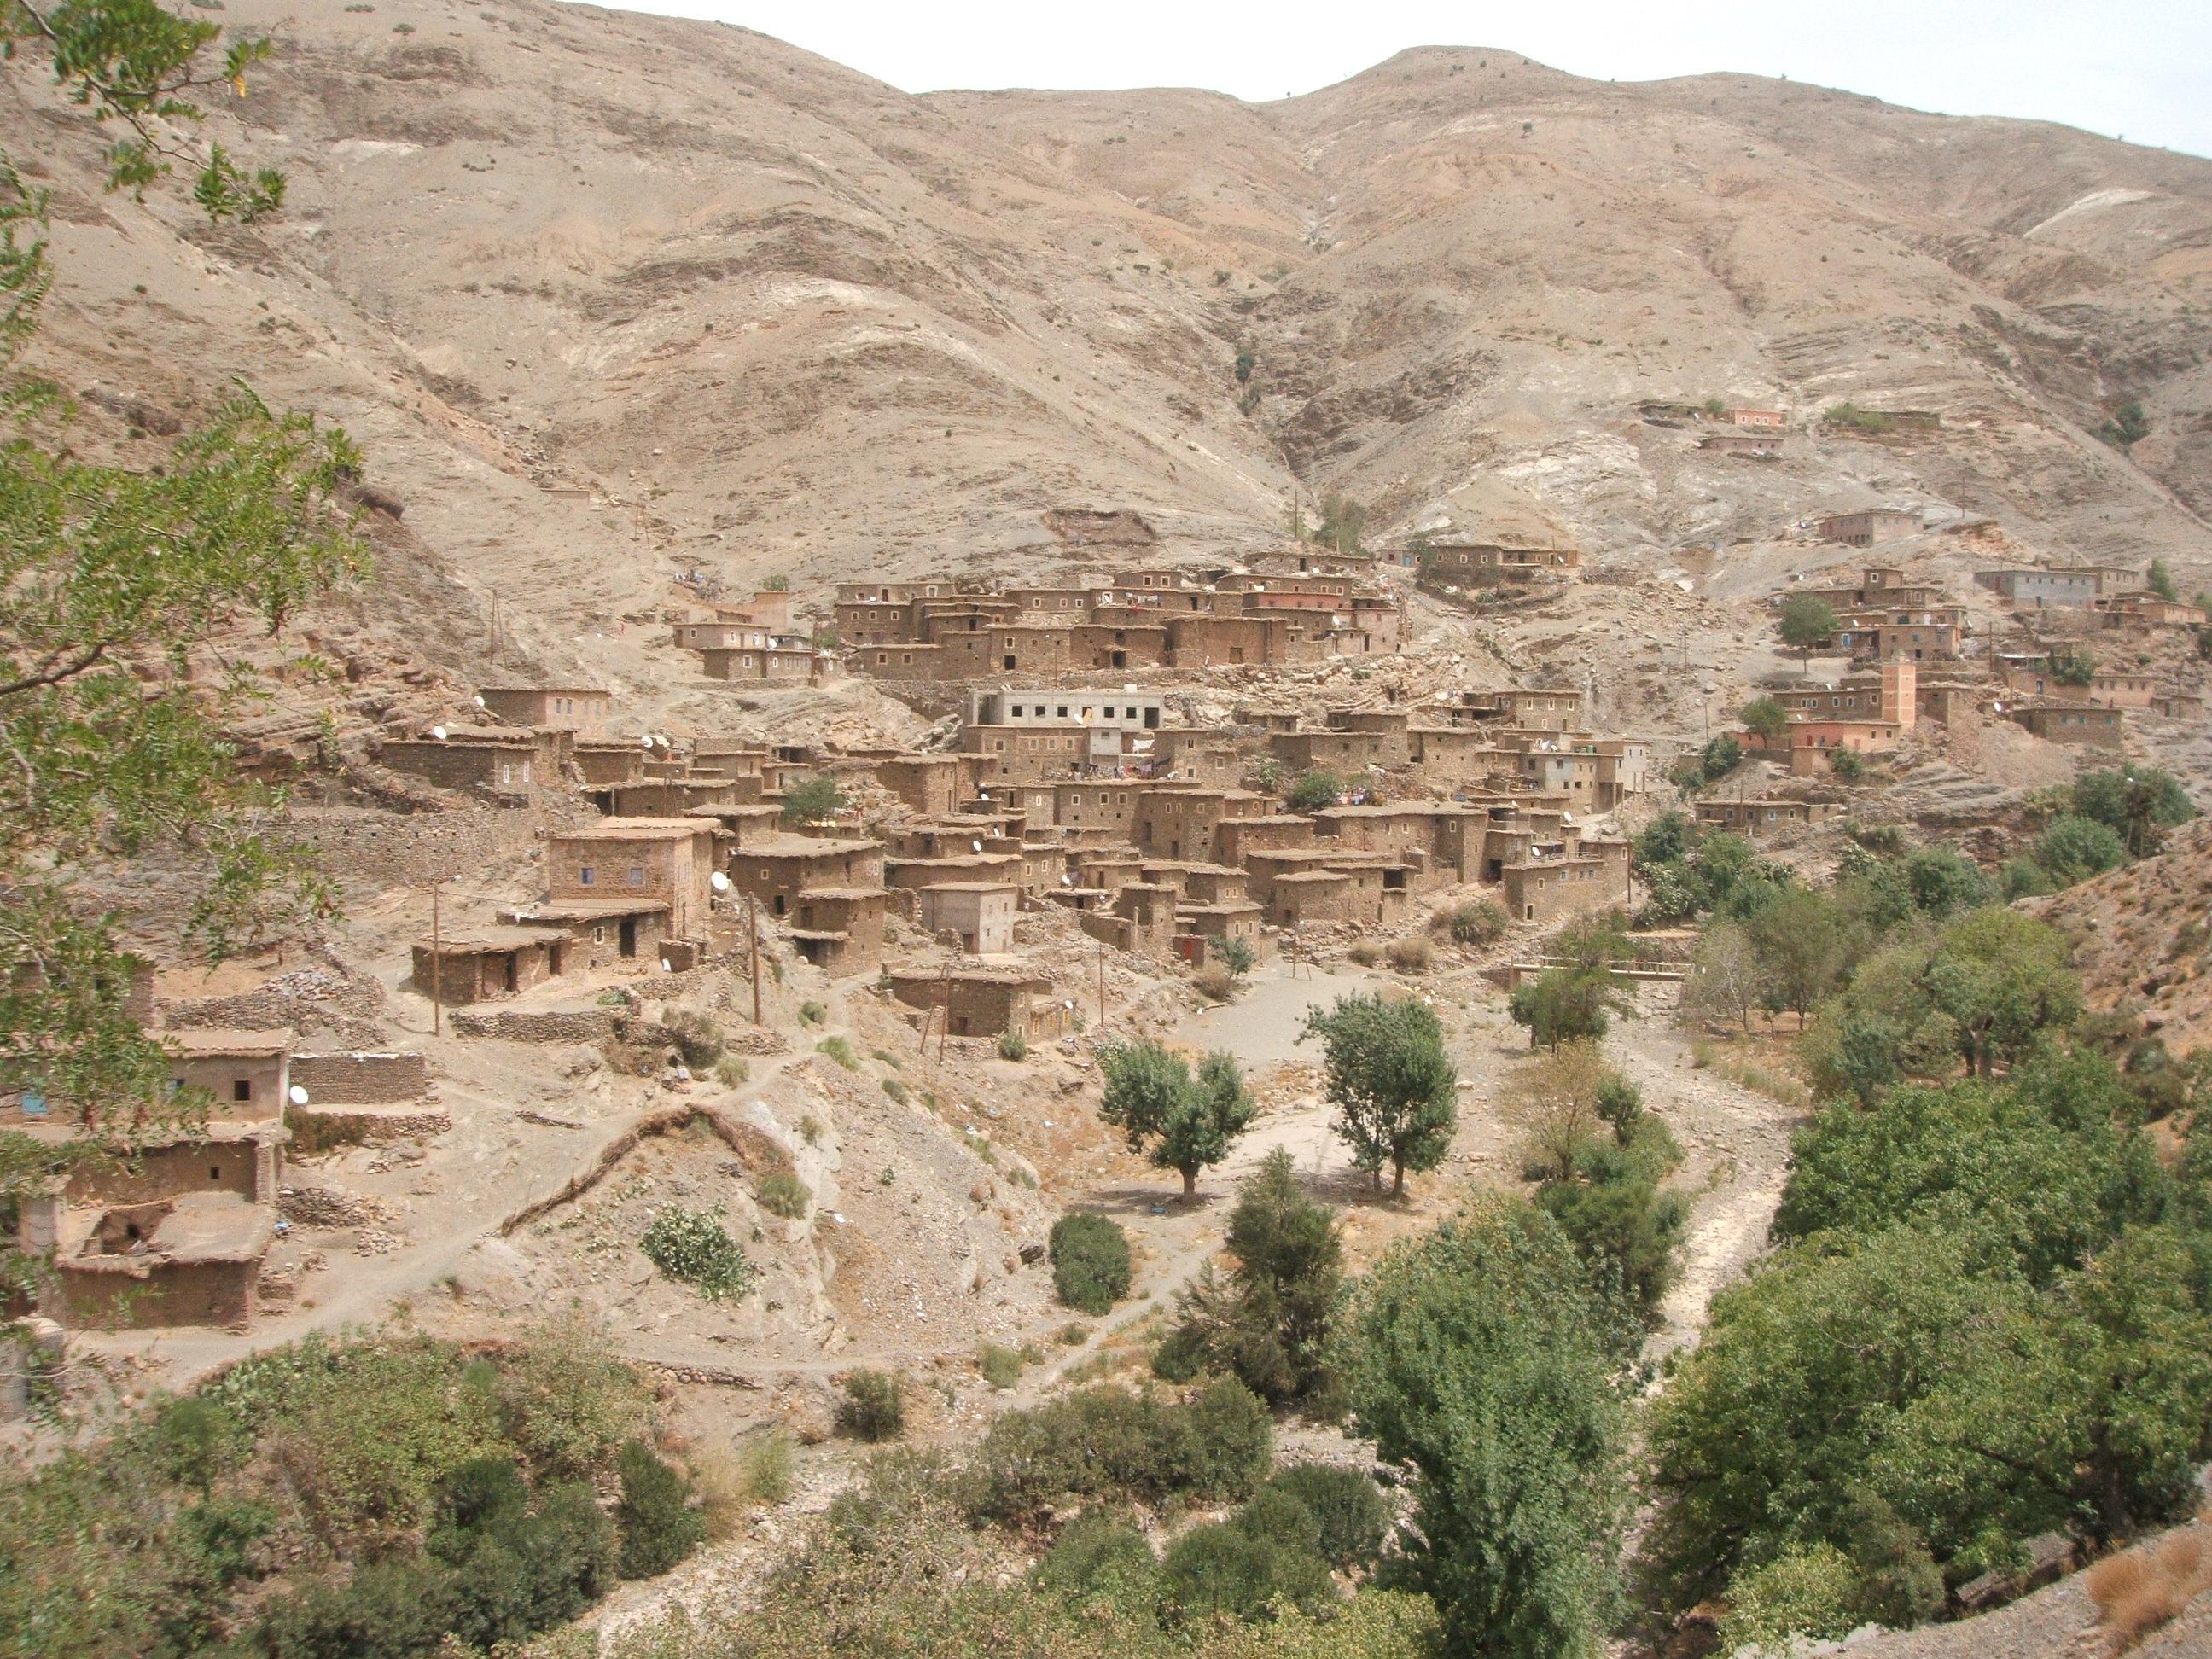 Marocco   la parola cresceva